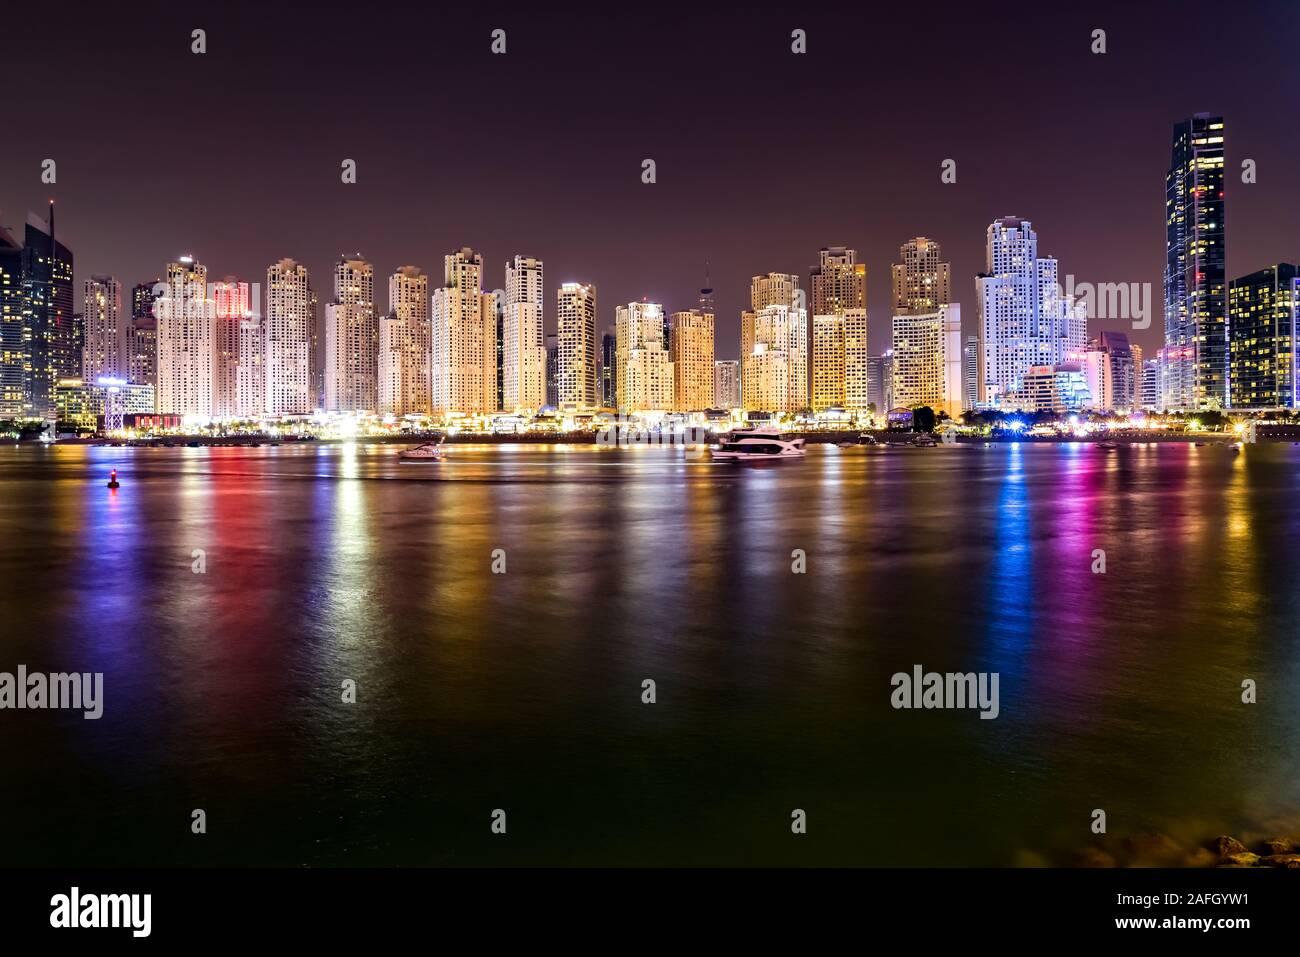 Dubai Skyline view at Bluewaters Island to Dubai Marina and Jumeira Beach Residence at night, Dubai, United Arab Emirates Stock Photo